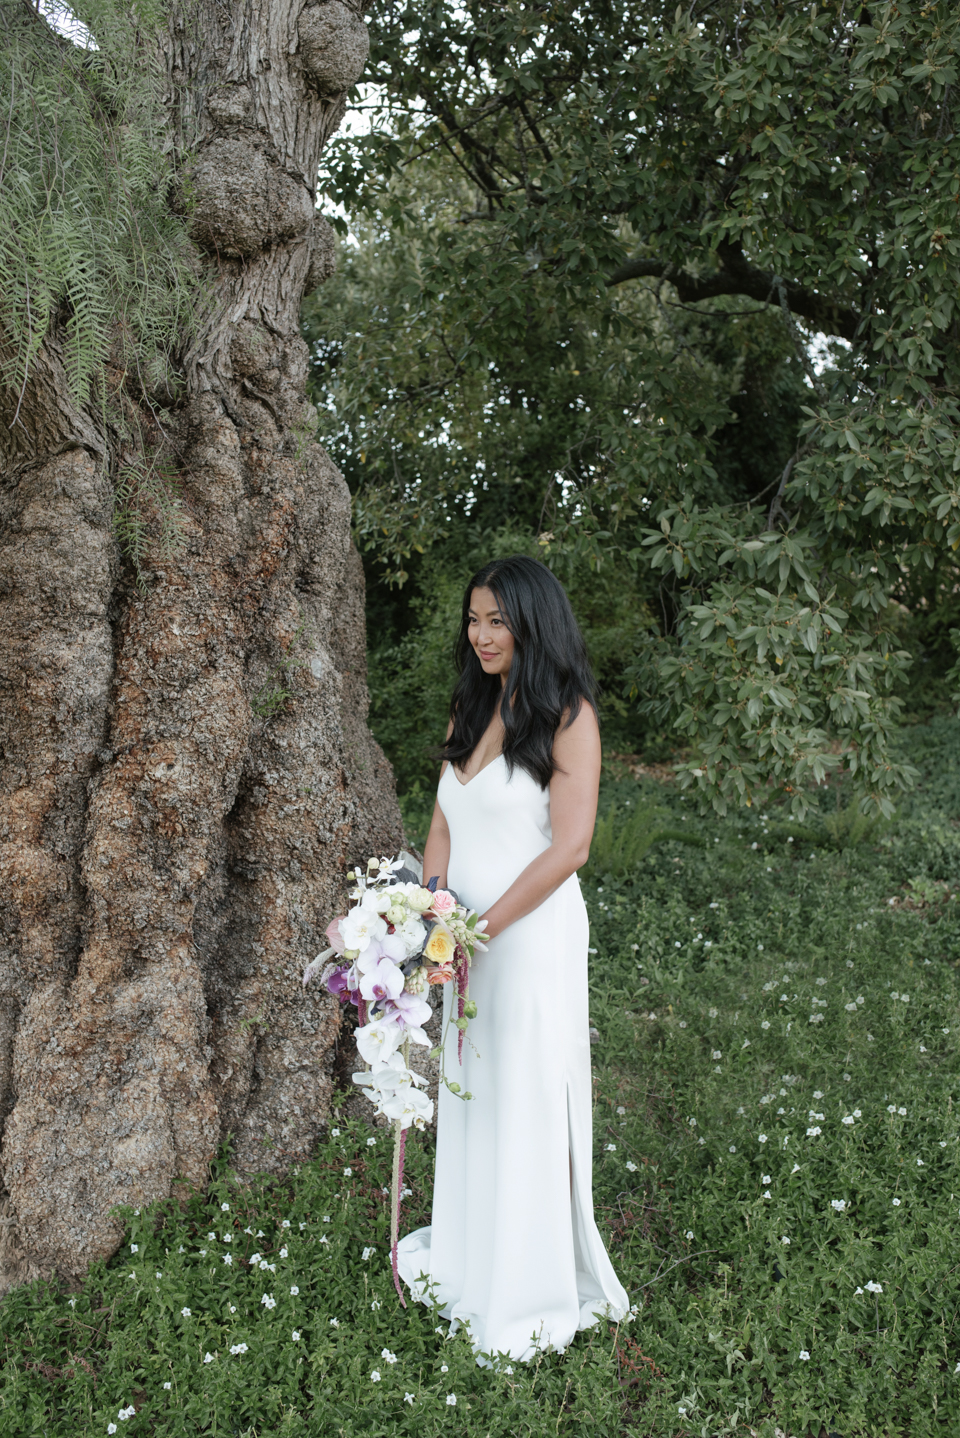 Grace and Alfonso wedding Clouds Estate Stellenbosch South Africa shot by dna photographers 713.jpg